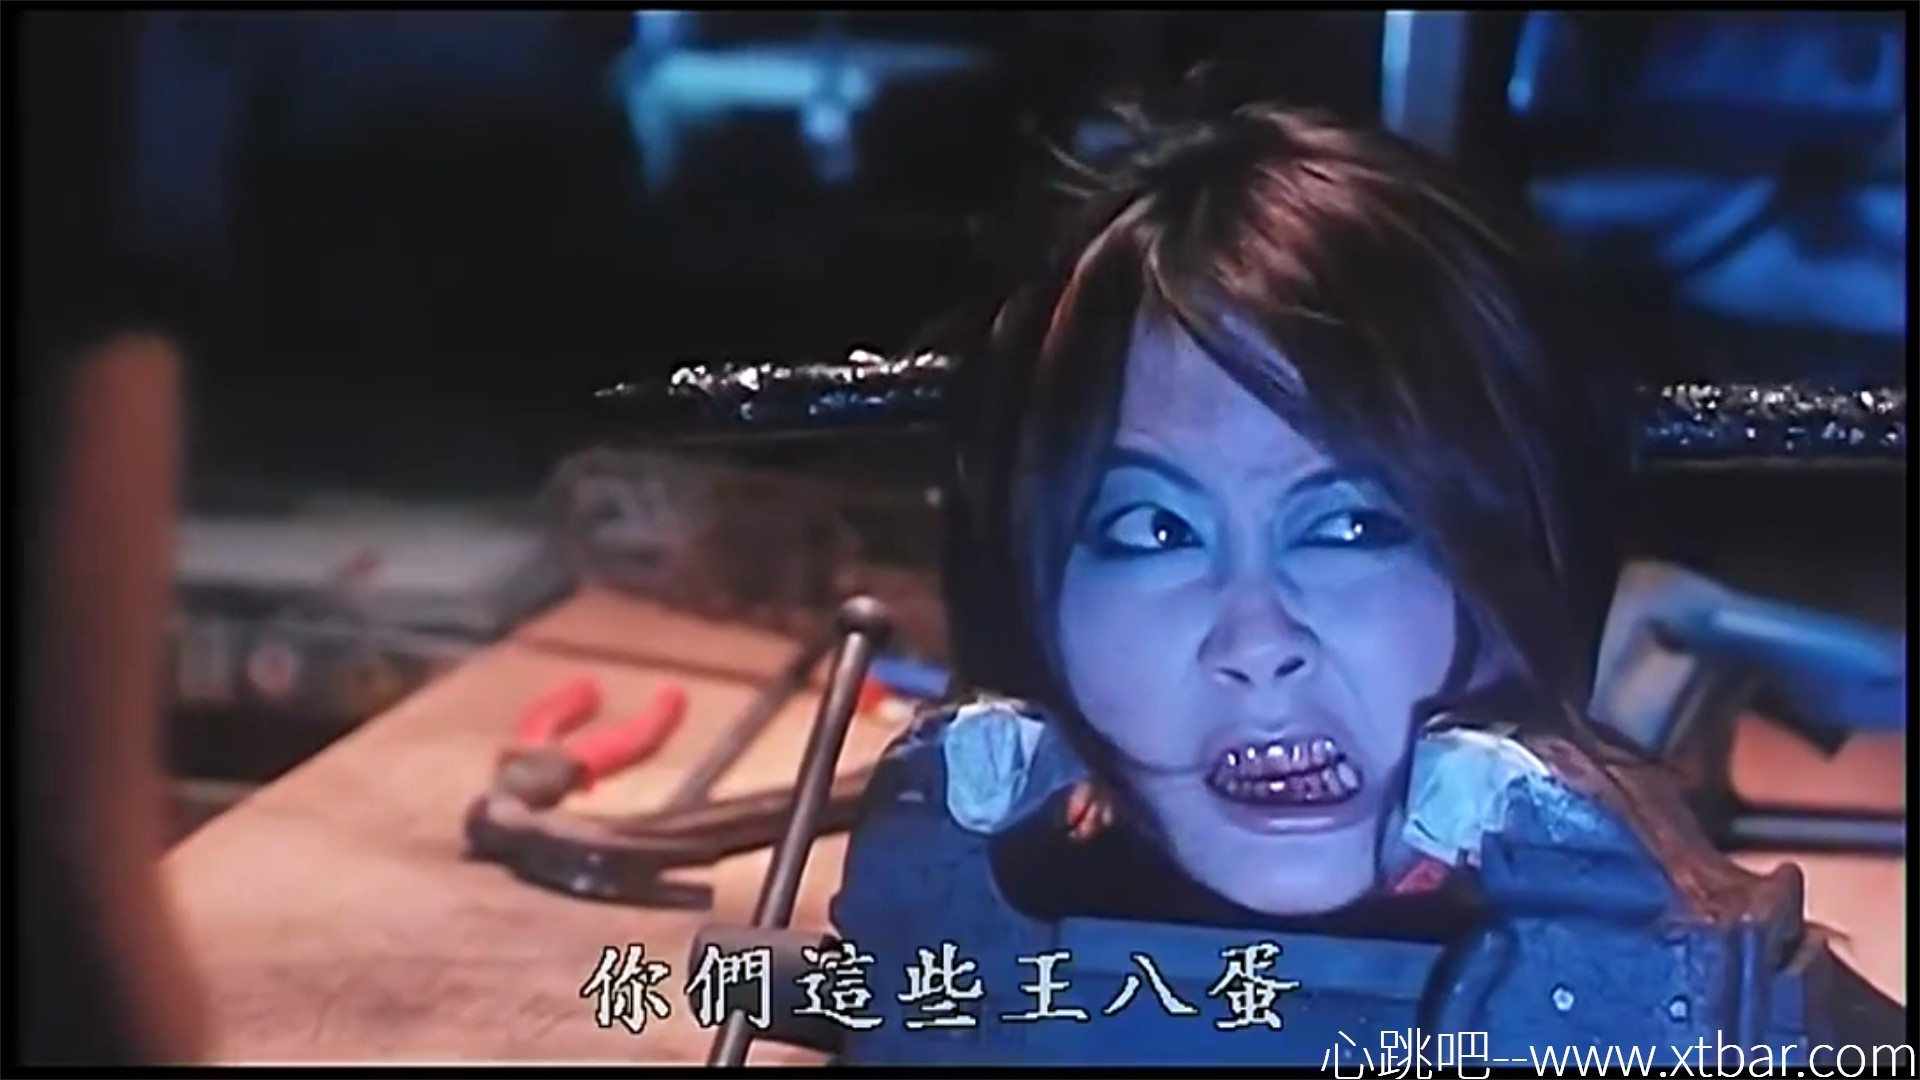 0085j6oIly1gnwj6mwjnmj31hc0u079t - [心跳吧恐怖片推荐]:中国香港-《鬼请你睇戏 Last Ghost Standing》